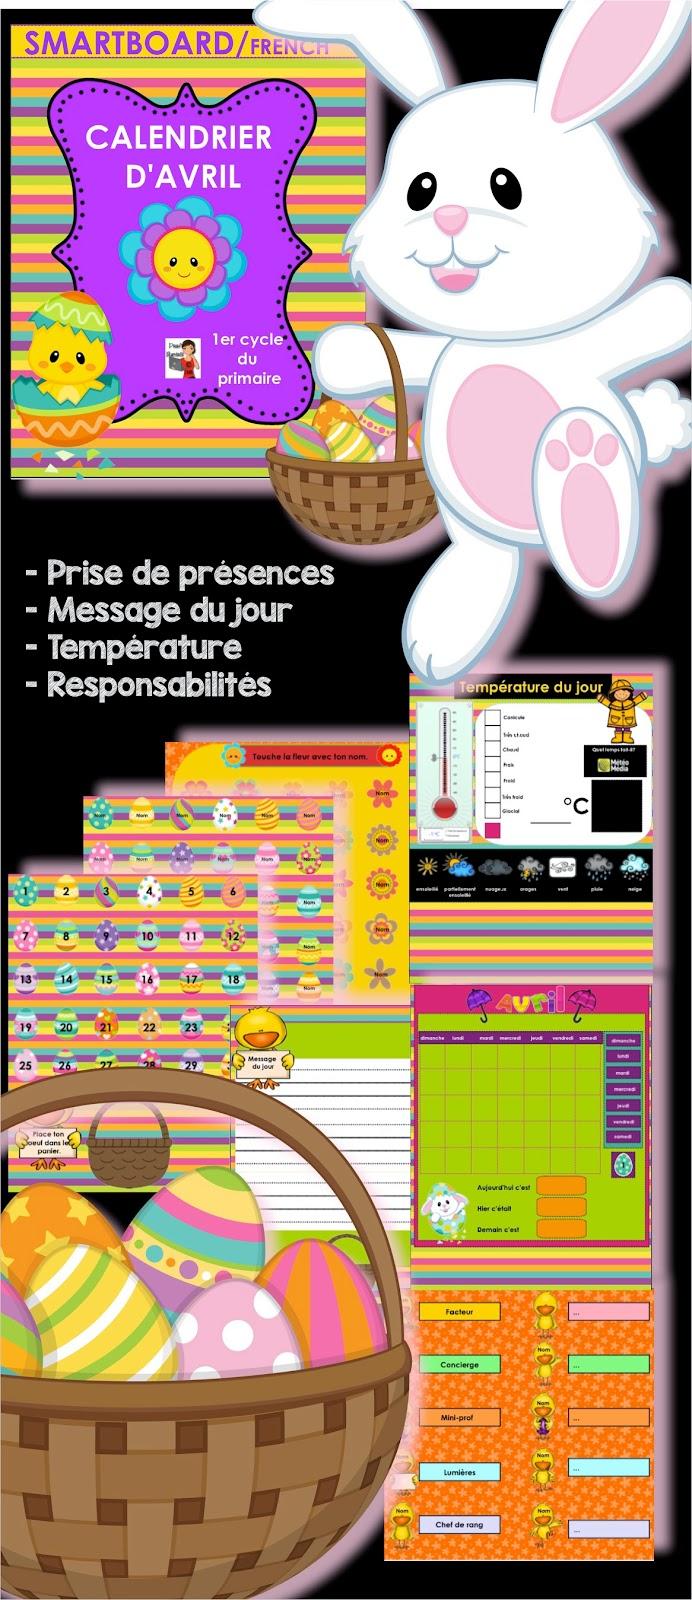 https://www.teacherspayteachers.com/Product/FRENCHSMARTBOARDCalendrier-du-mois-davril-oeufs-fleurs-1170149